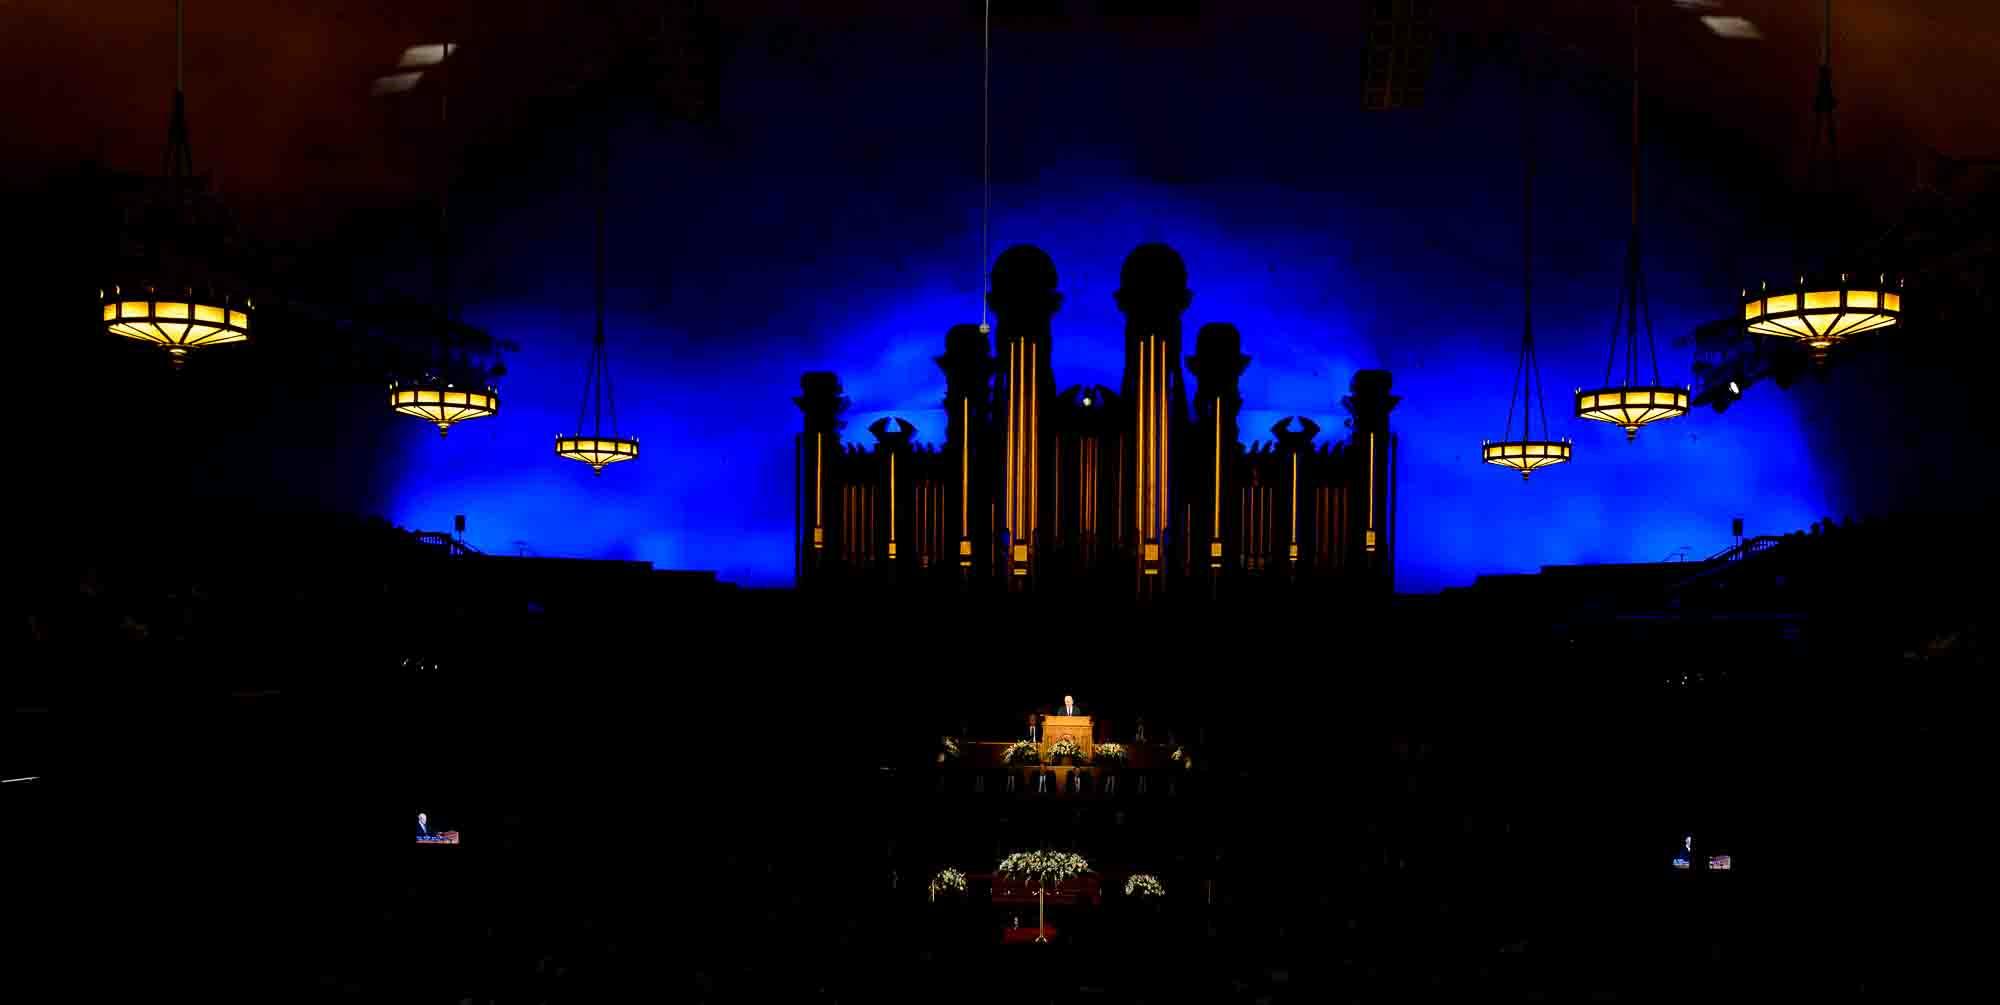 (Trent Nelson | The Salt Lake Tribune) President Russell M. Nelson speaks at funeral services for Elder Robert D. Hales at the Salt Lake Tabernacle in Salt Lake City Friday October 6, 2017.